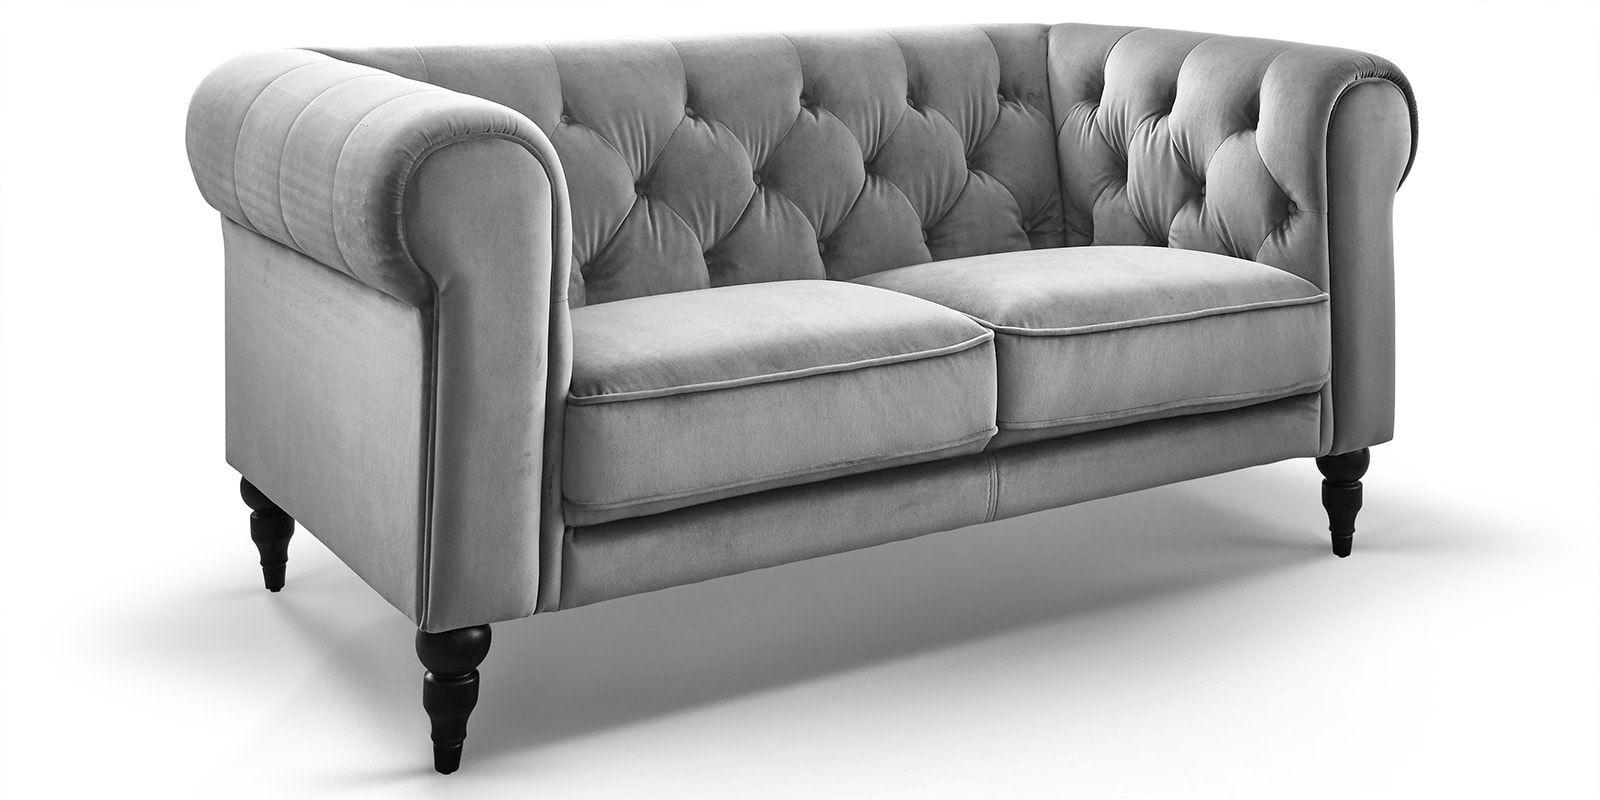 2 Sitzer Chesterfield Samt Hudson Comfort2home Bequemes Sofa 2 Sitzer Sofa Sitzkissen